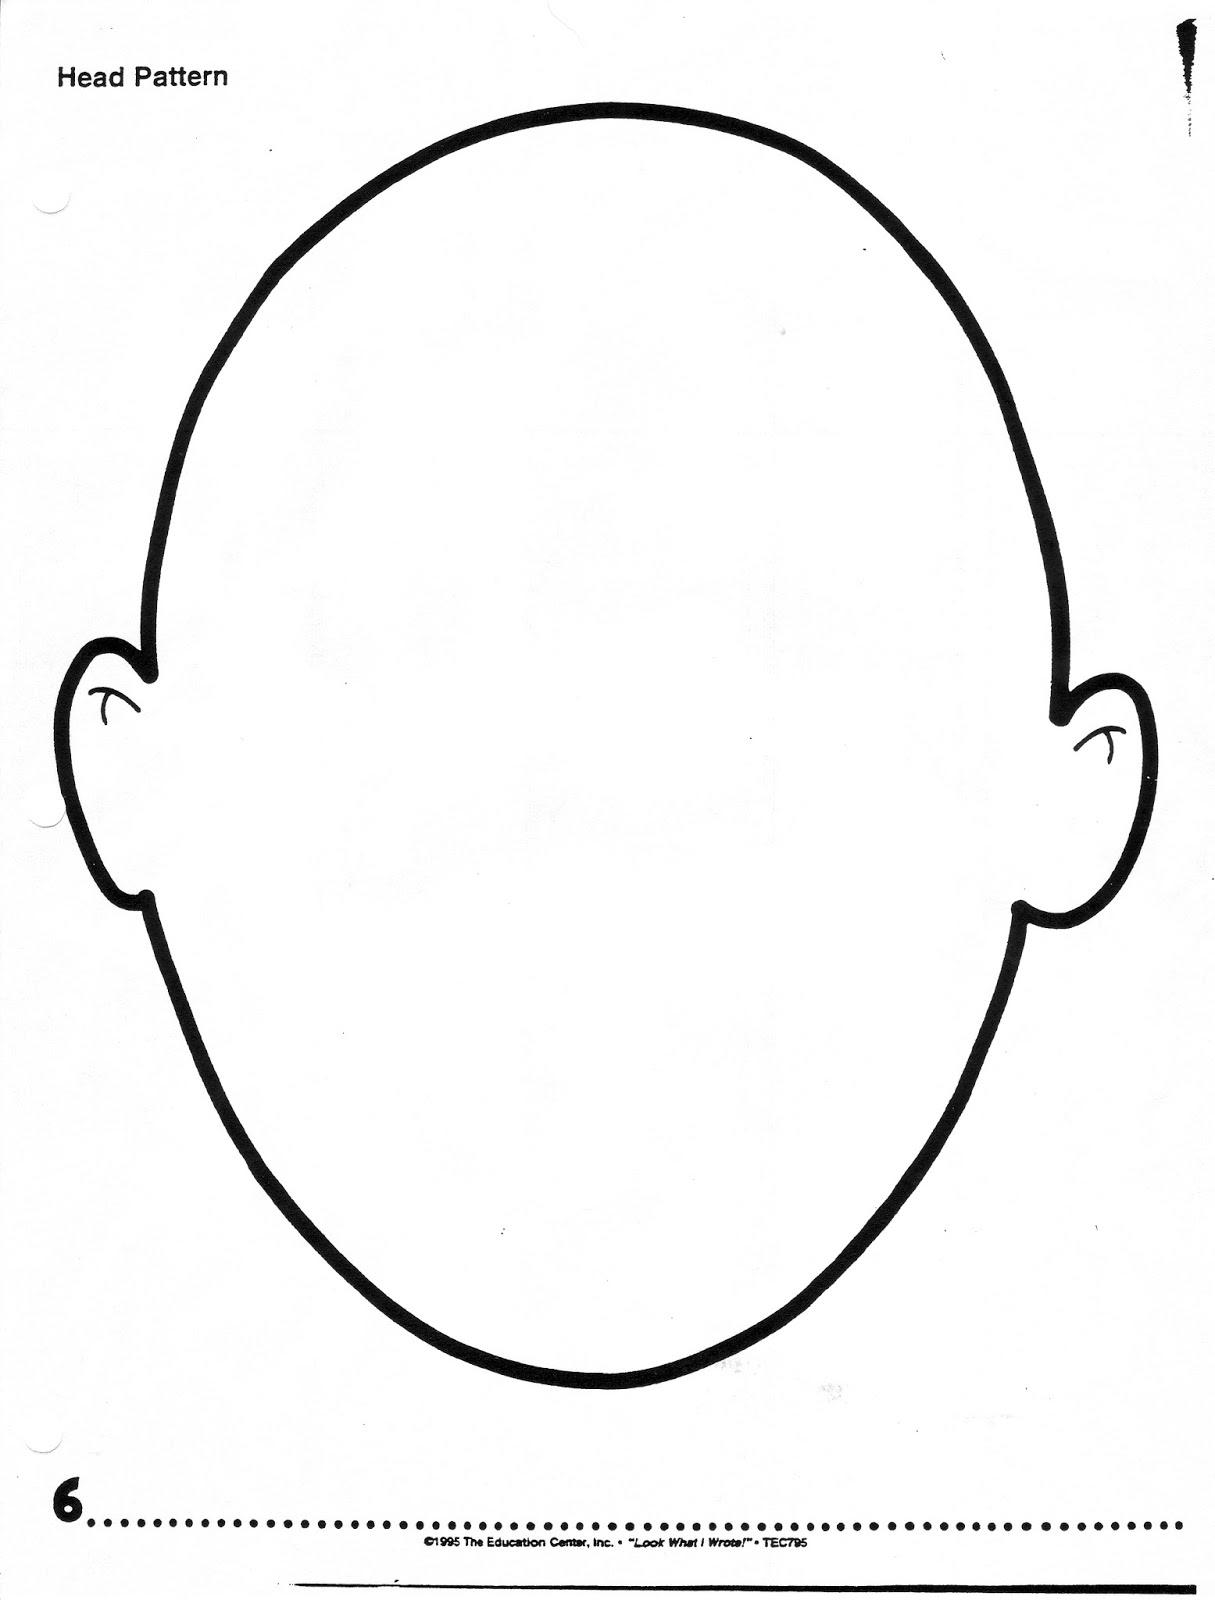 Blank Head Template